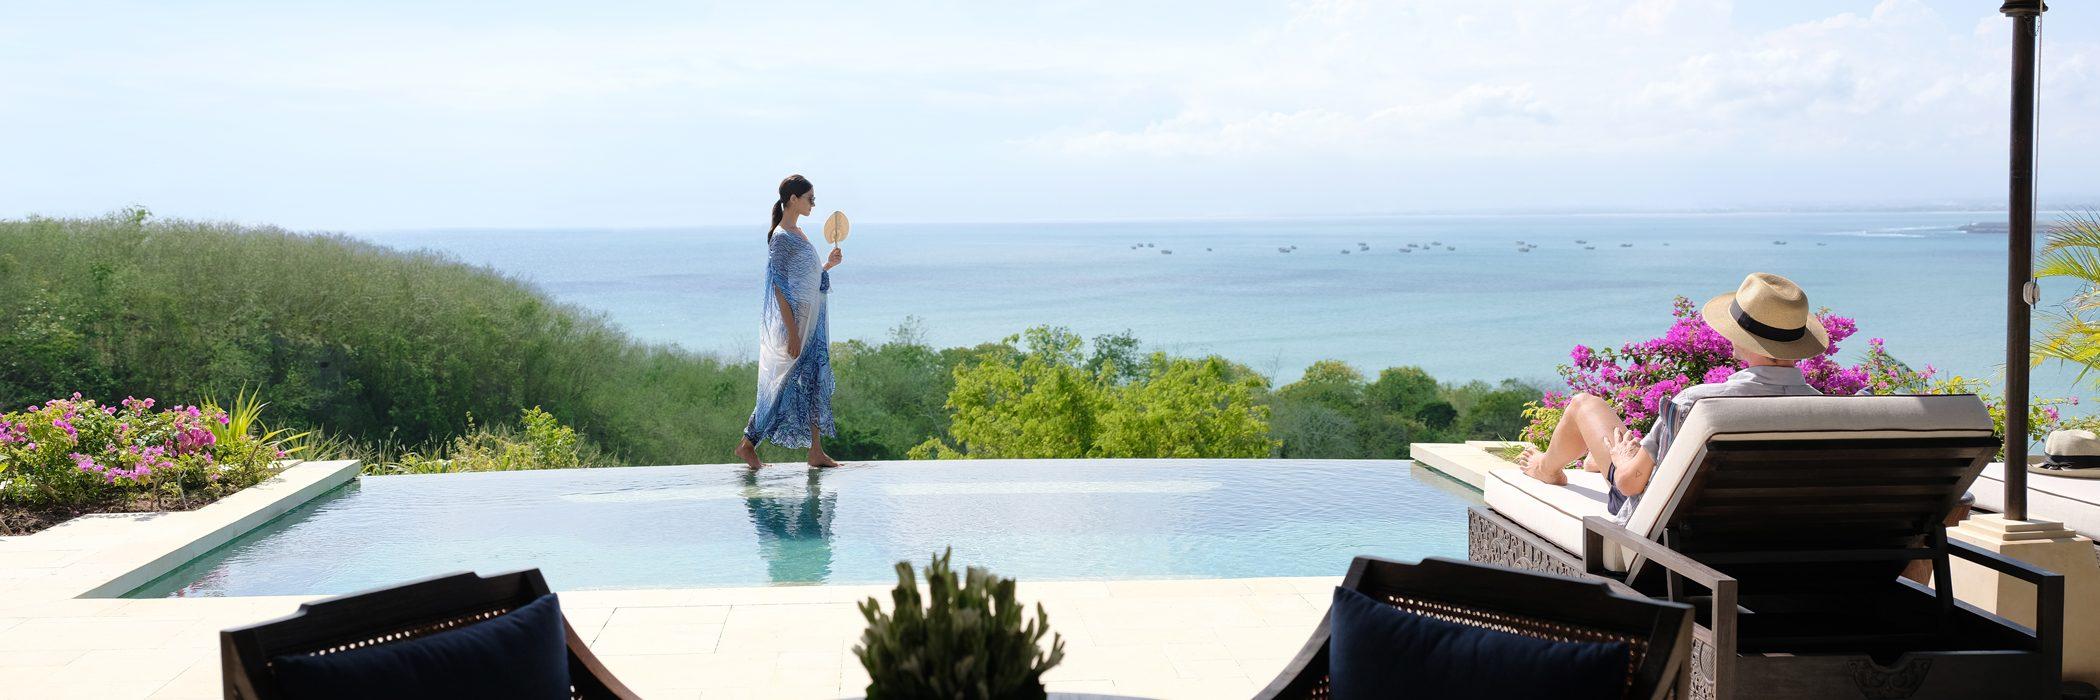 Raffles Bali - Raffles Bali Exquisite Opening Experience